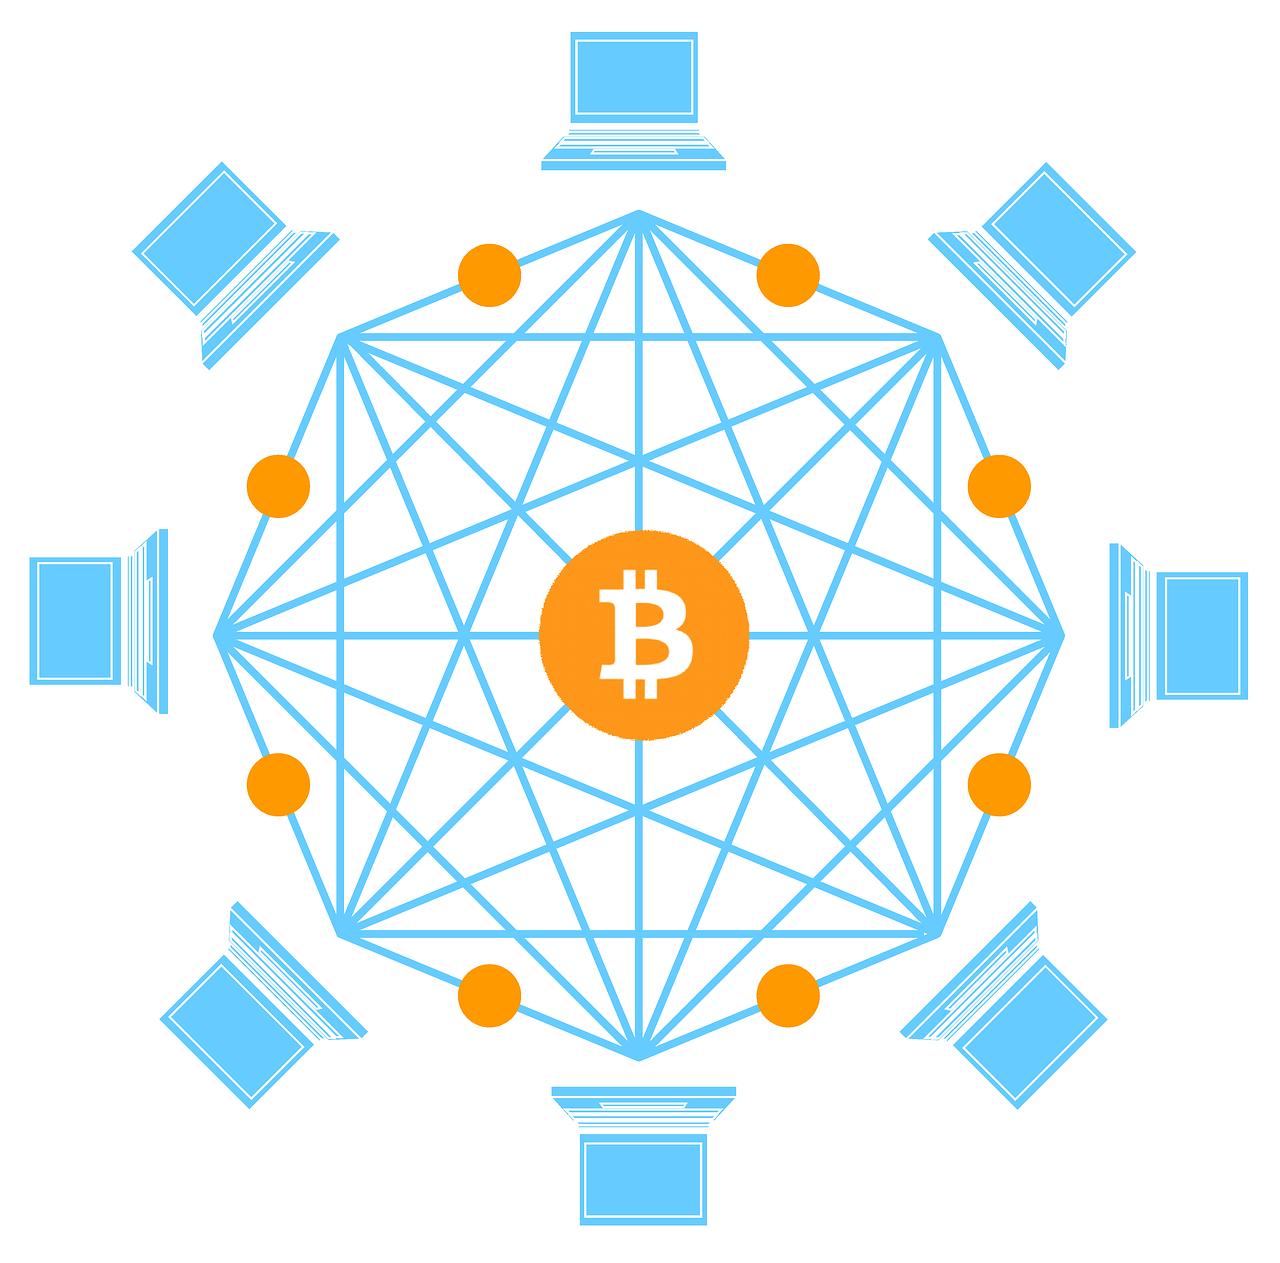 bitcoin-3012035_1280.png